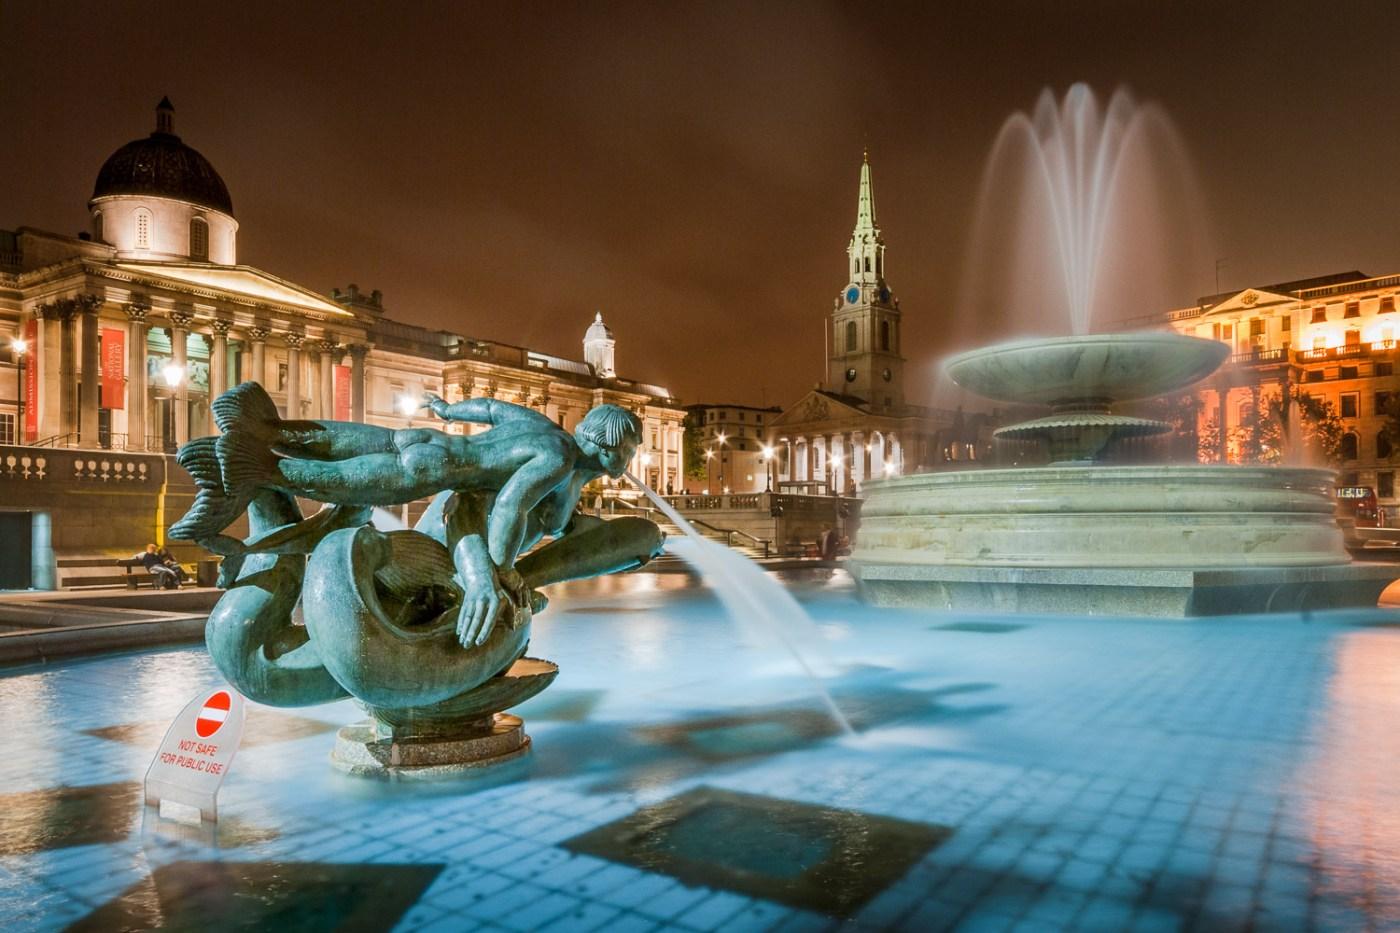 Trafalgar Square Fountains at Night